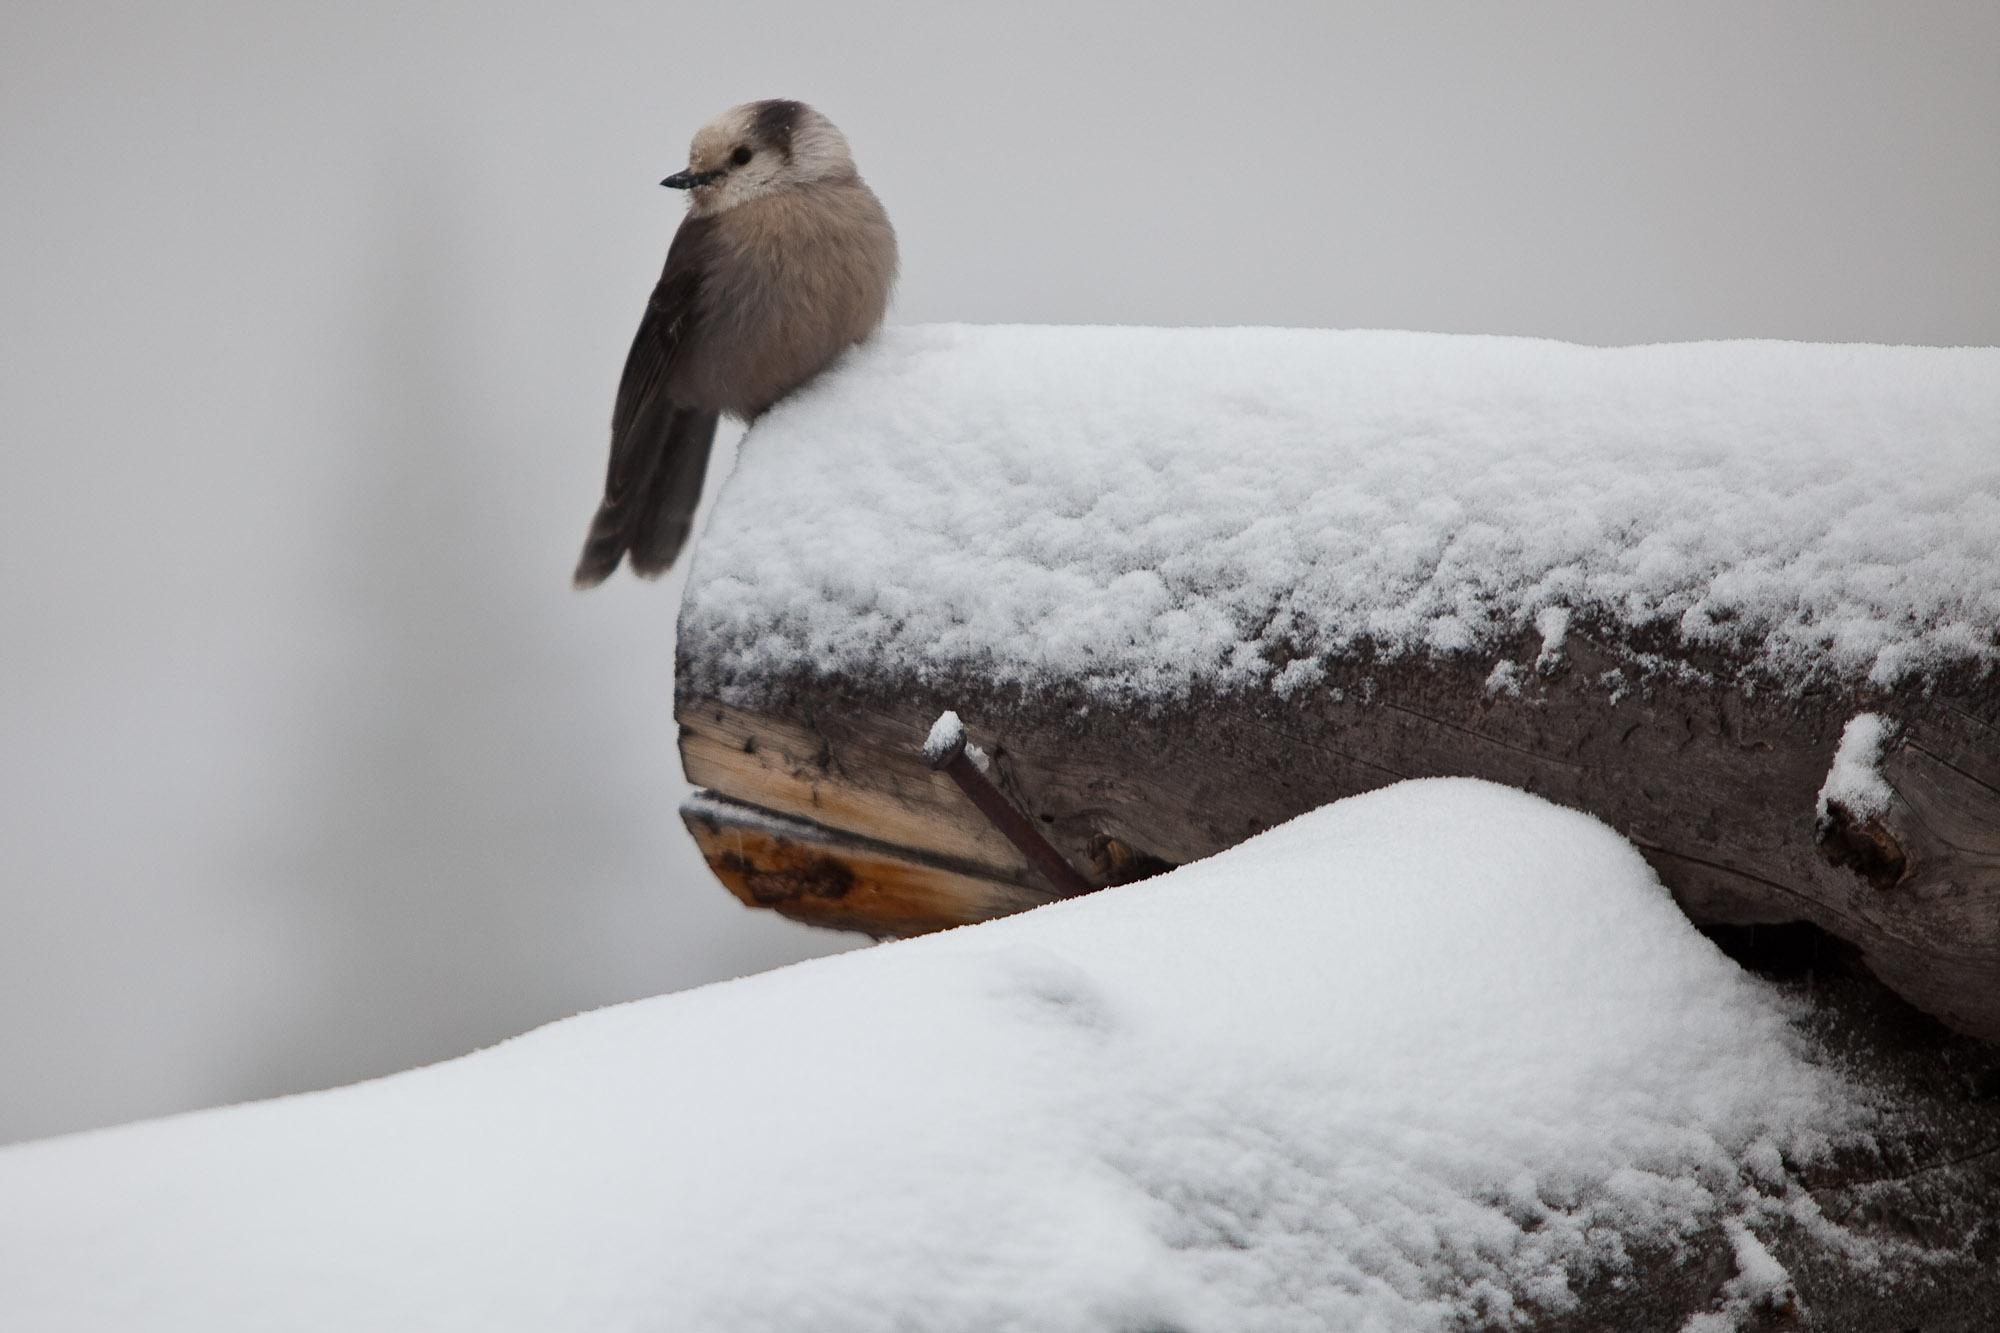 Bird in the snow at Aspen how quaint